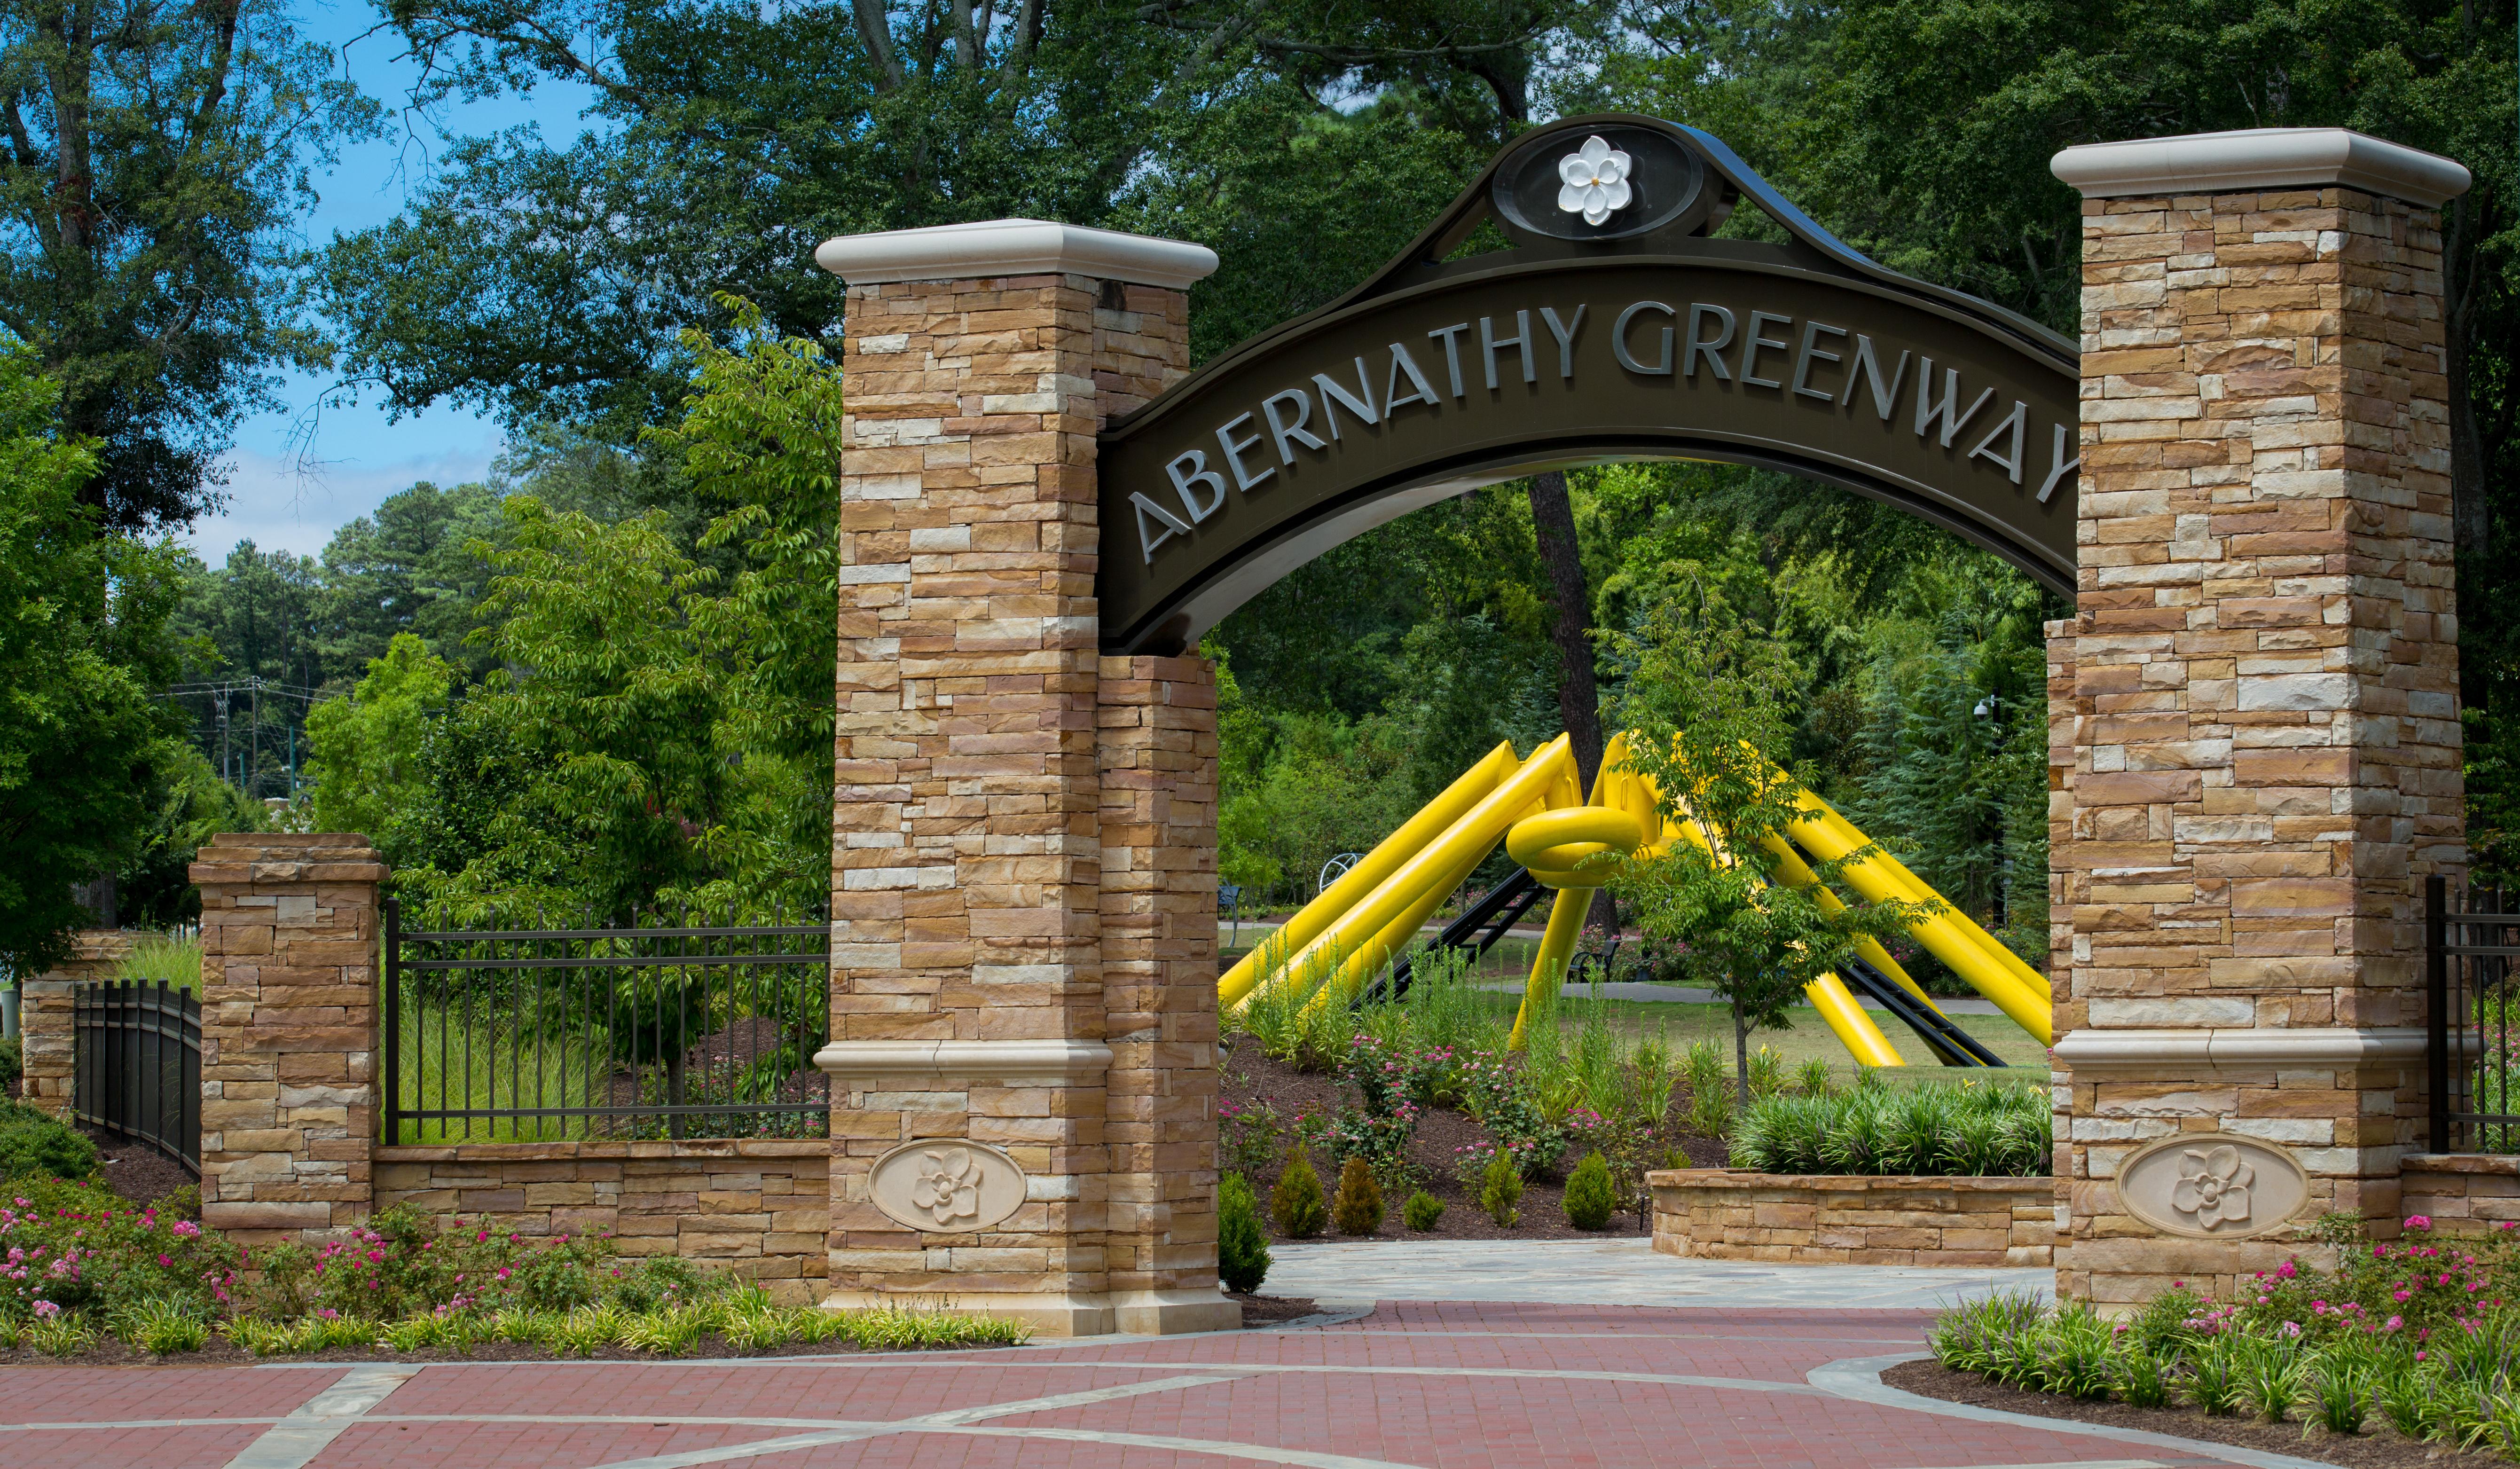 Abernathy Greenway Park